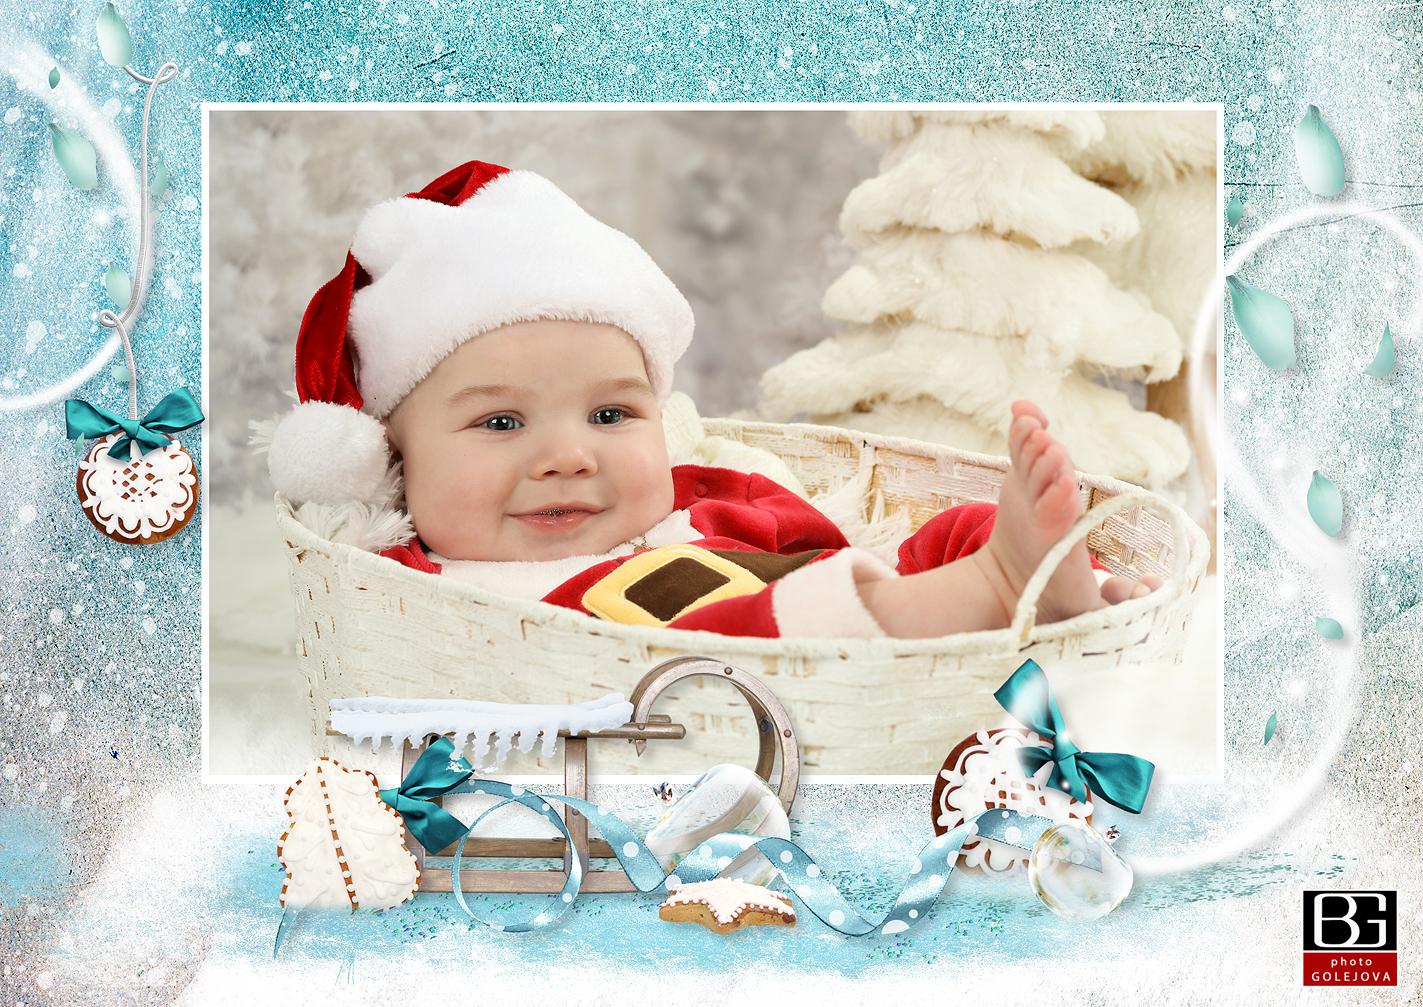 frozen-vianocne-pohladnice